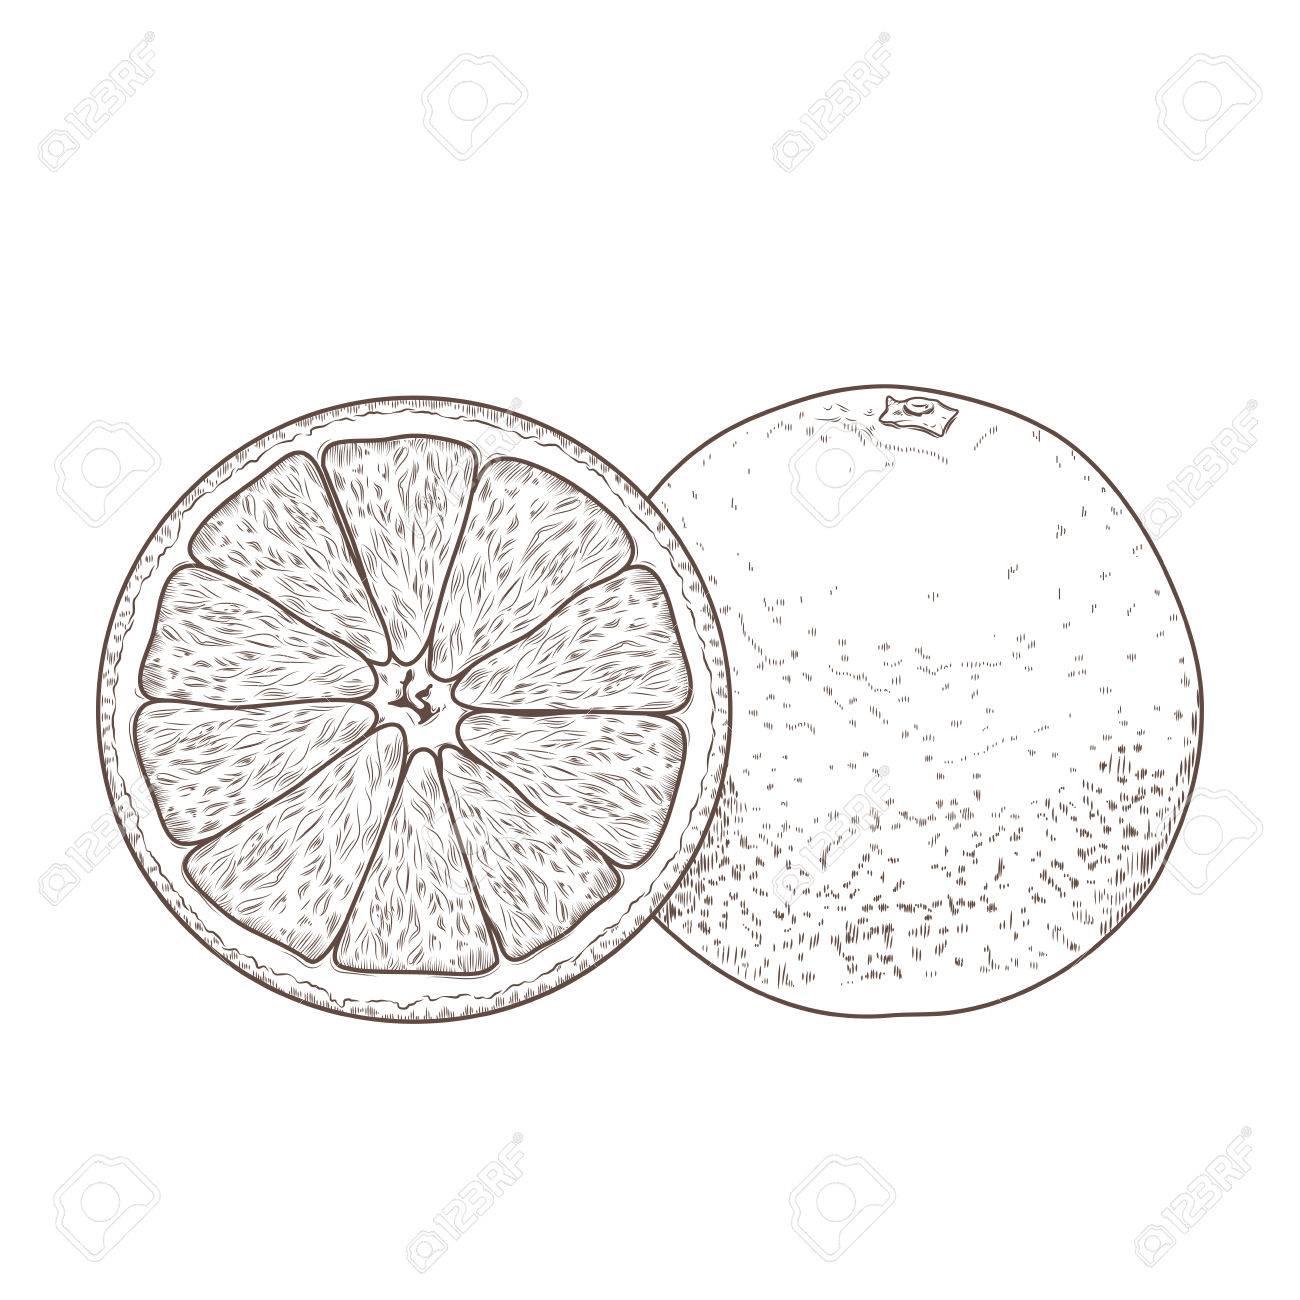 1300x1300 Sliced Orange Fruits Isolated On A White Background. Hand Drawn